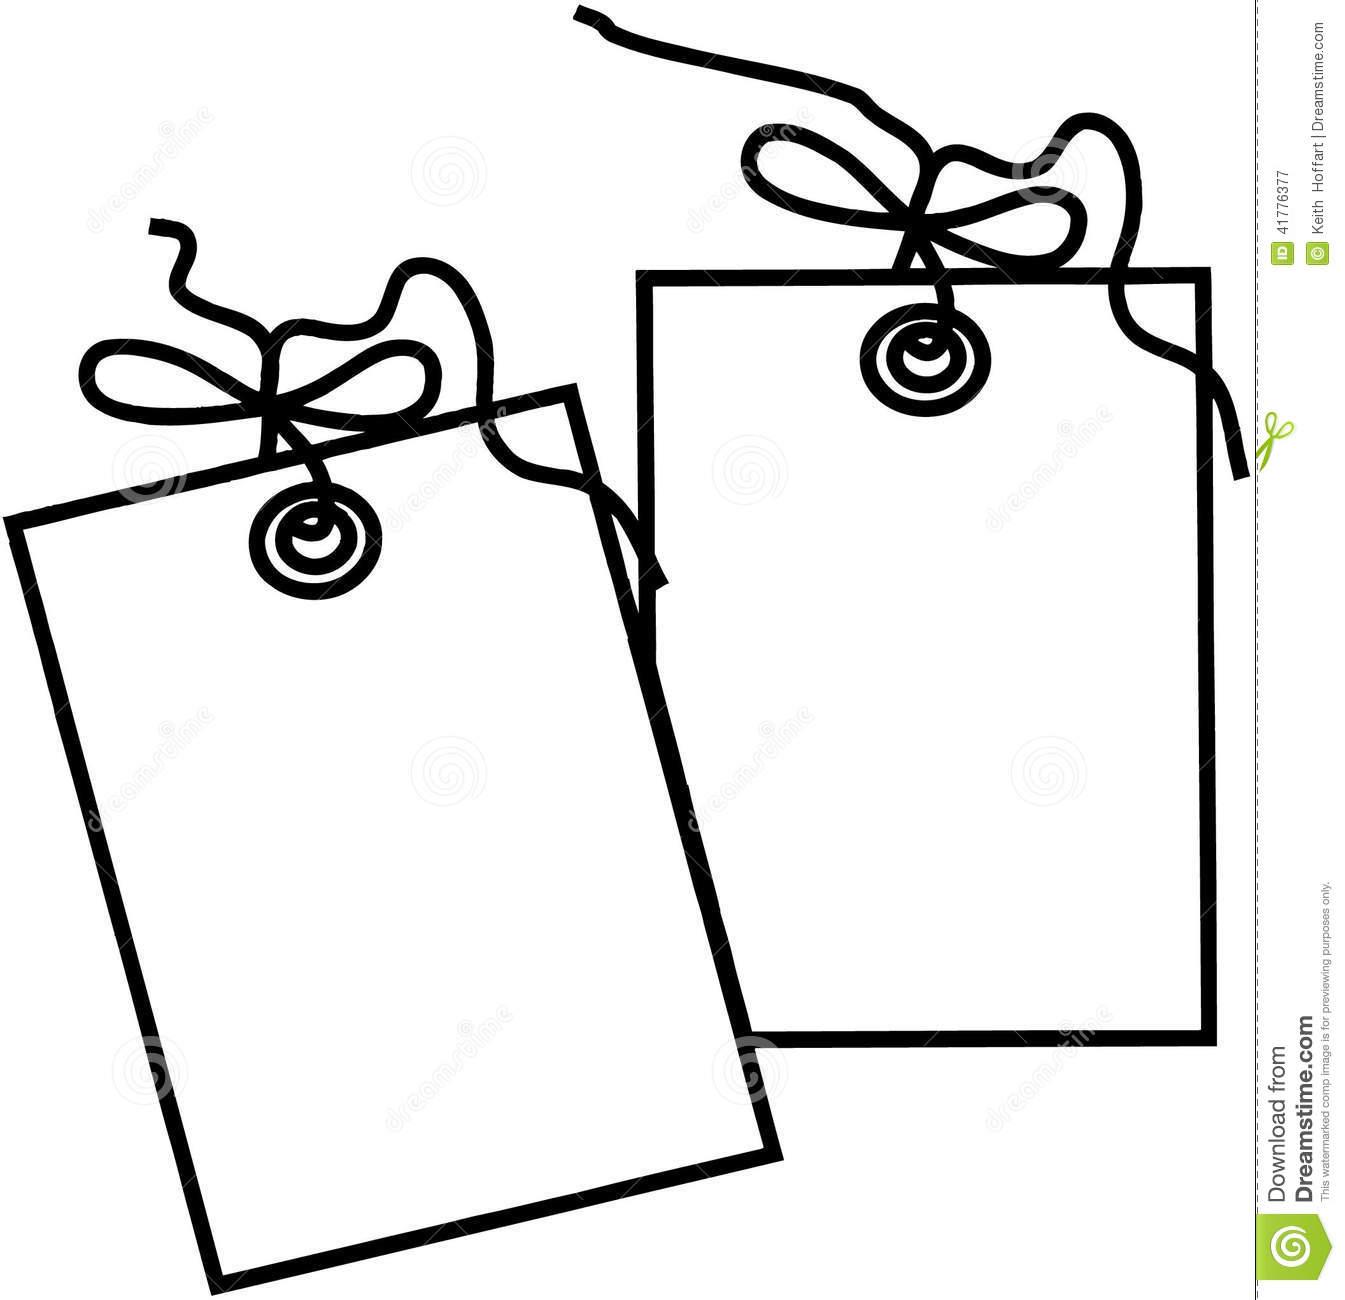 gift tag template cartoon clipart panda free clipart images rh clipartpanda com happy birthday gift tag clipart